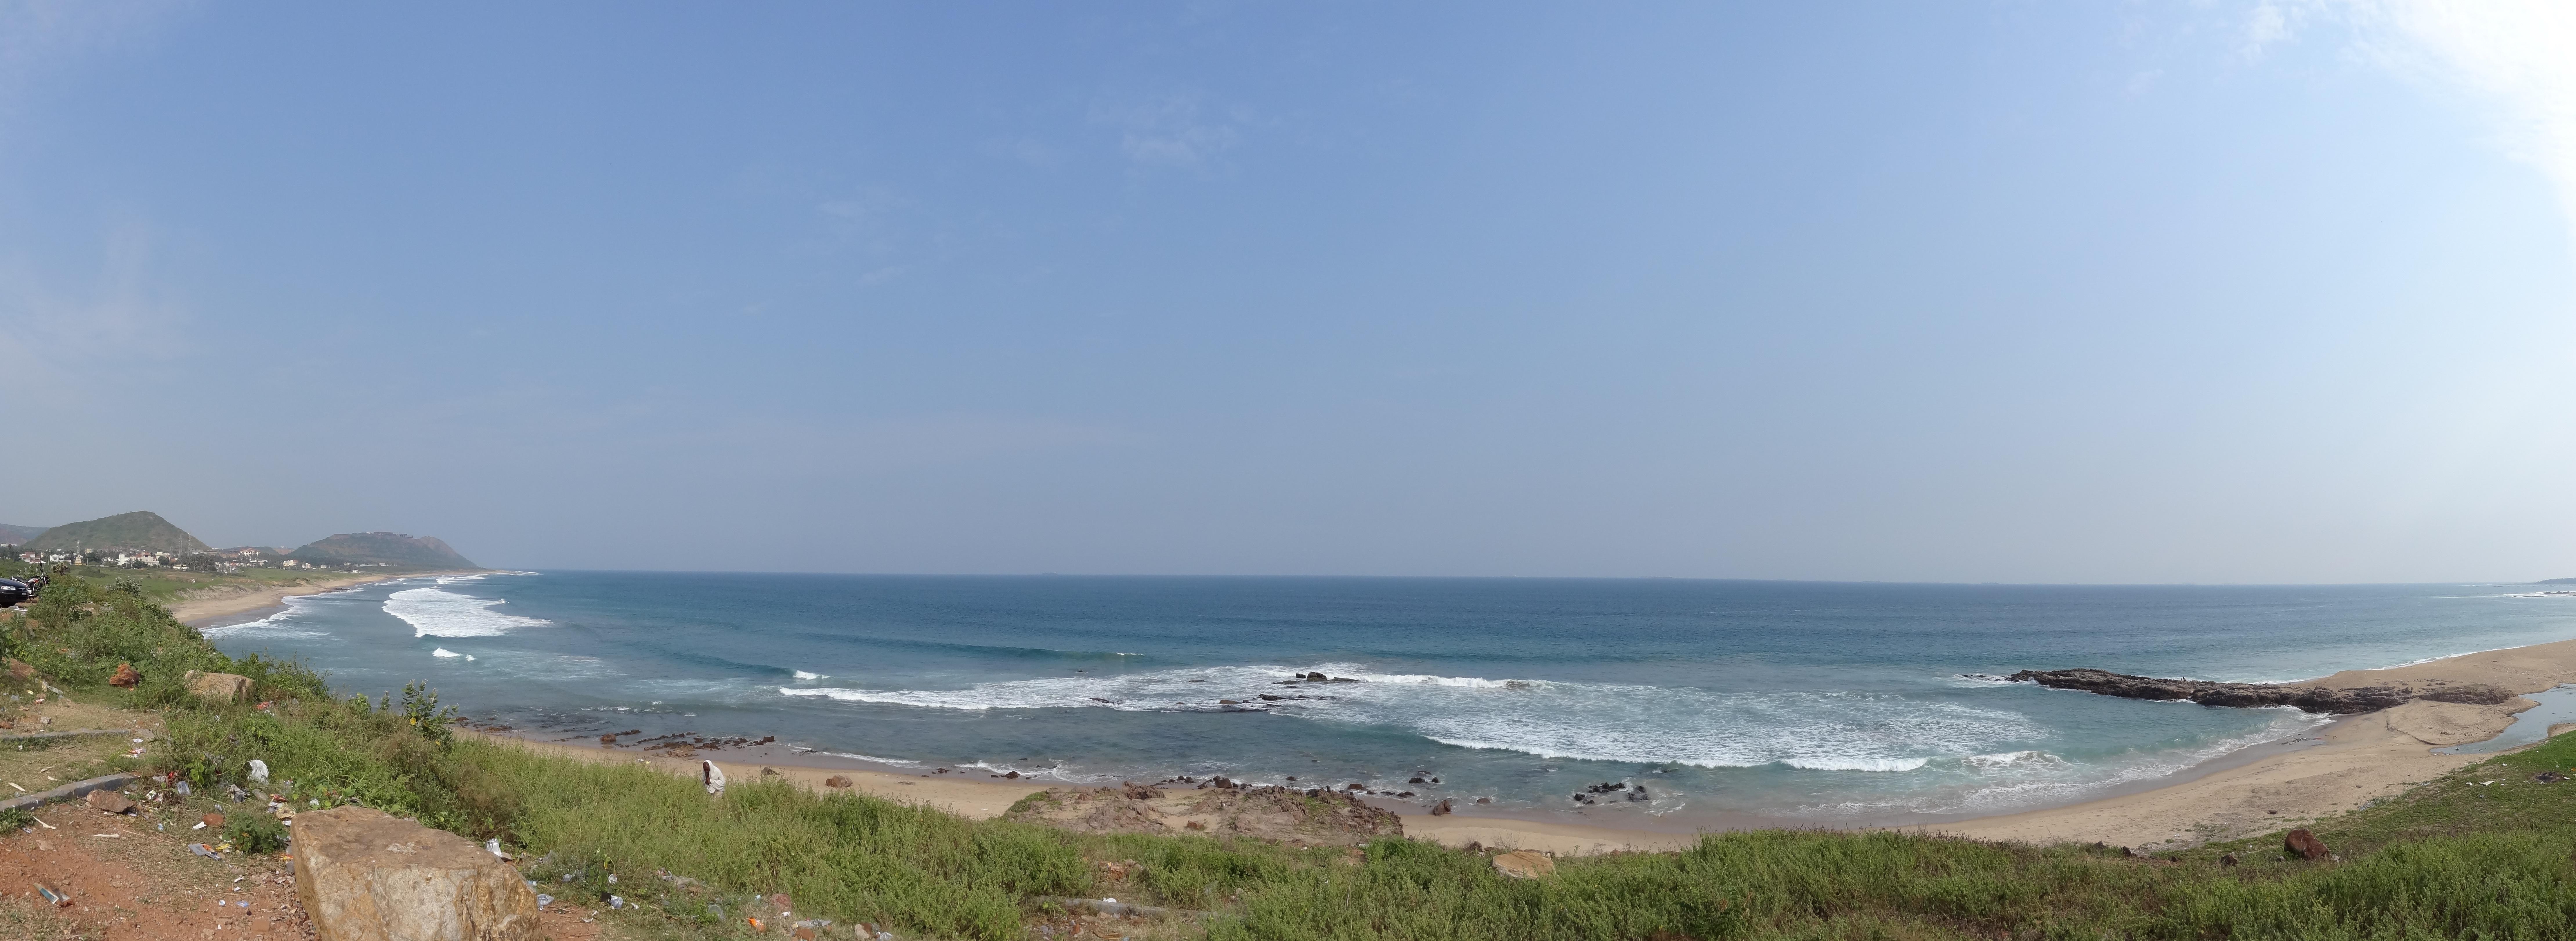 Visakhapatnam Sea Beach